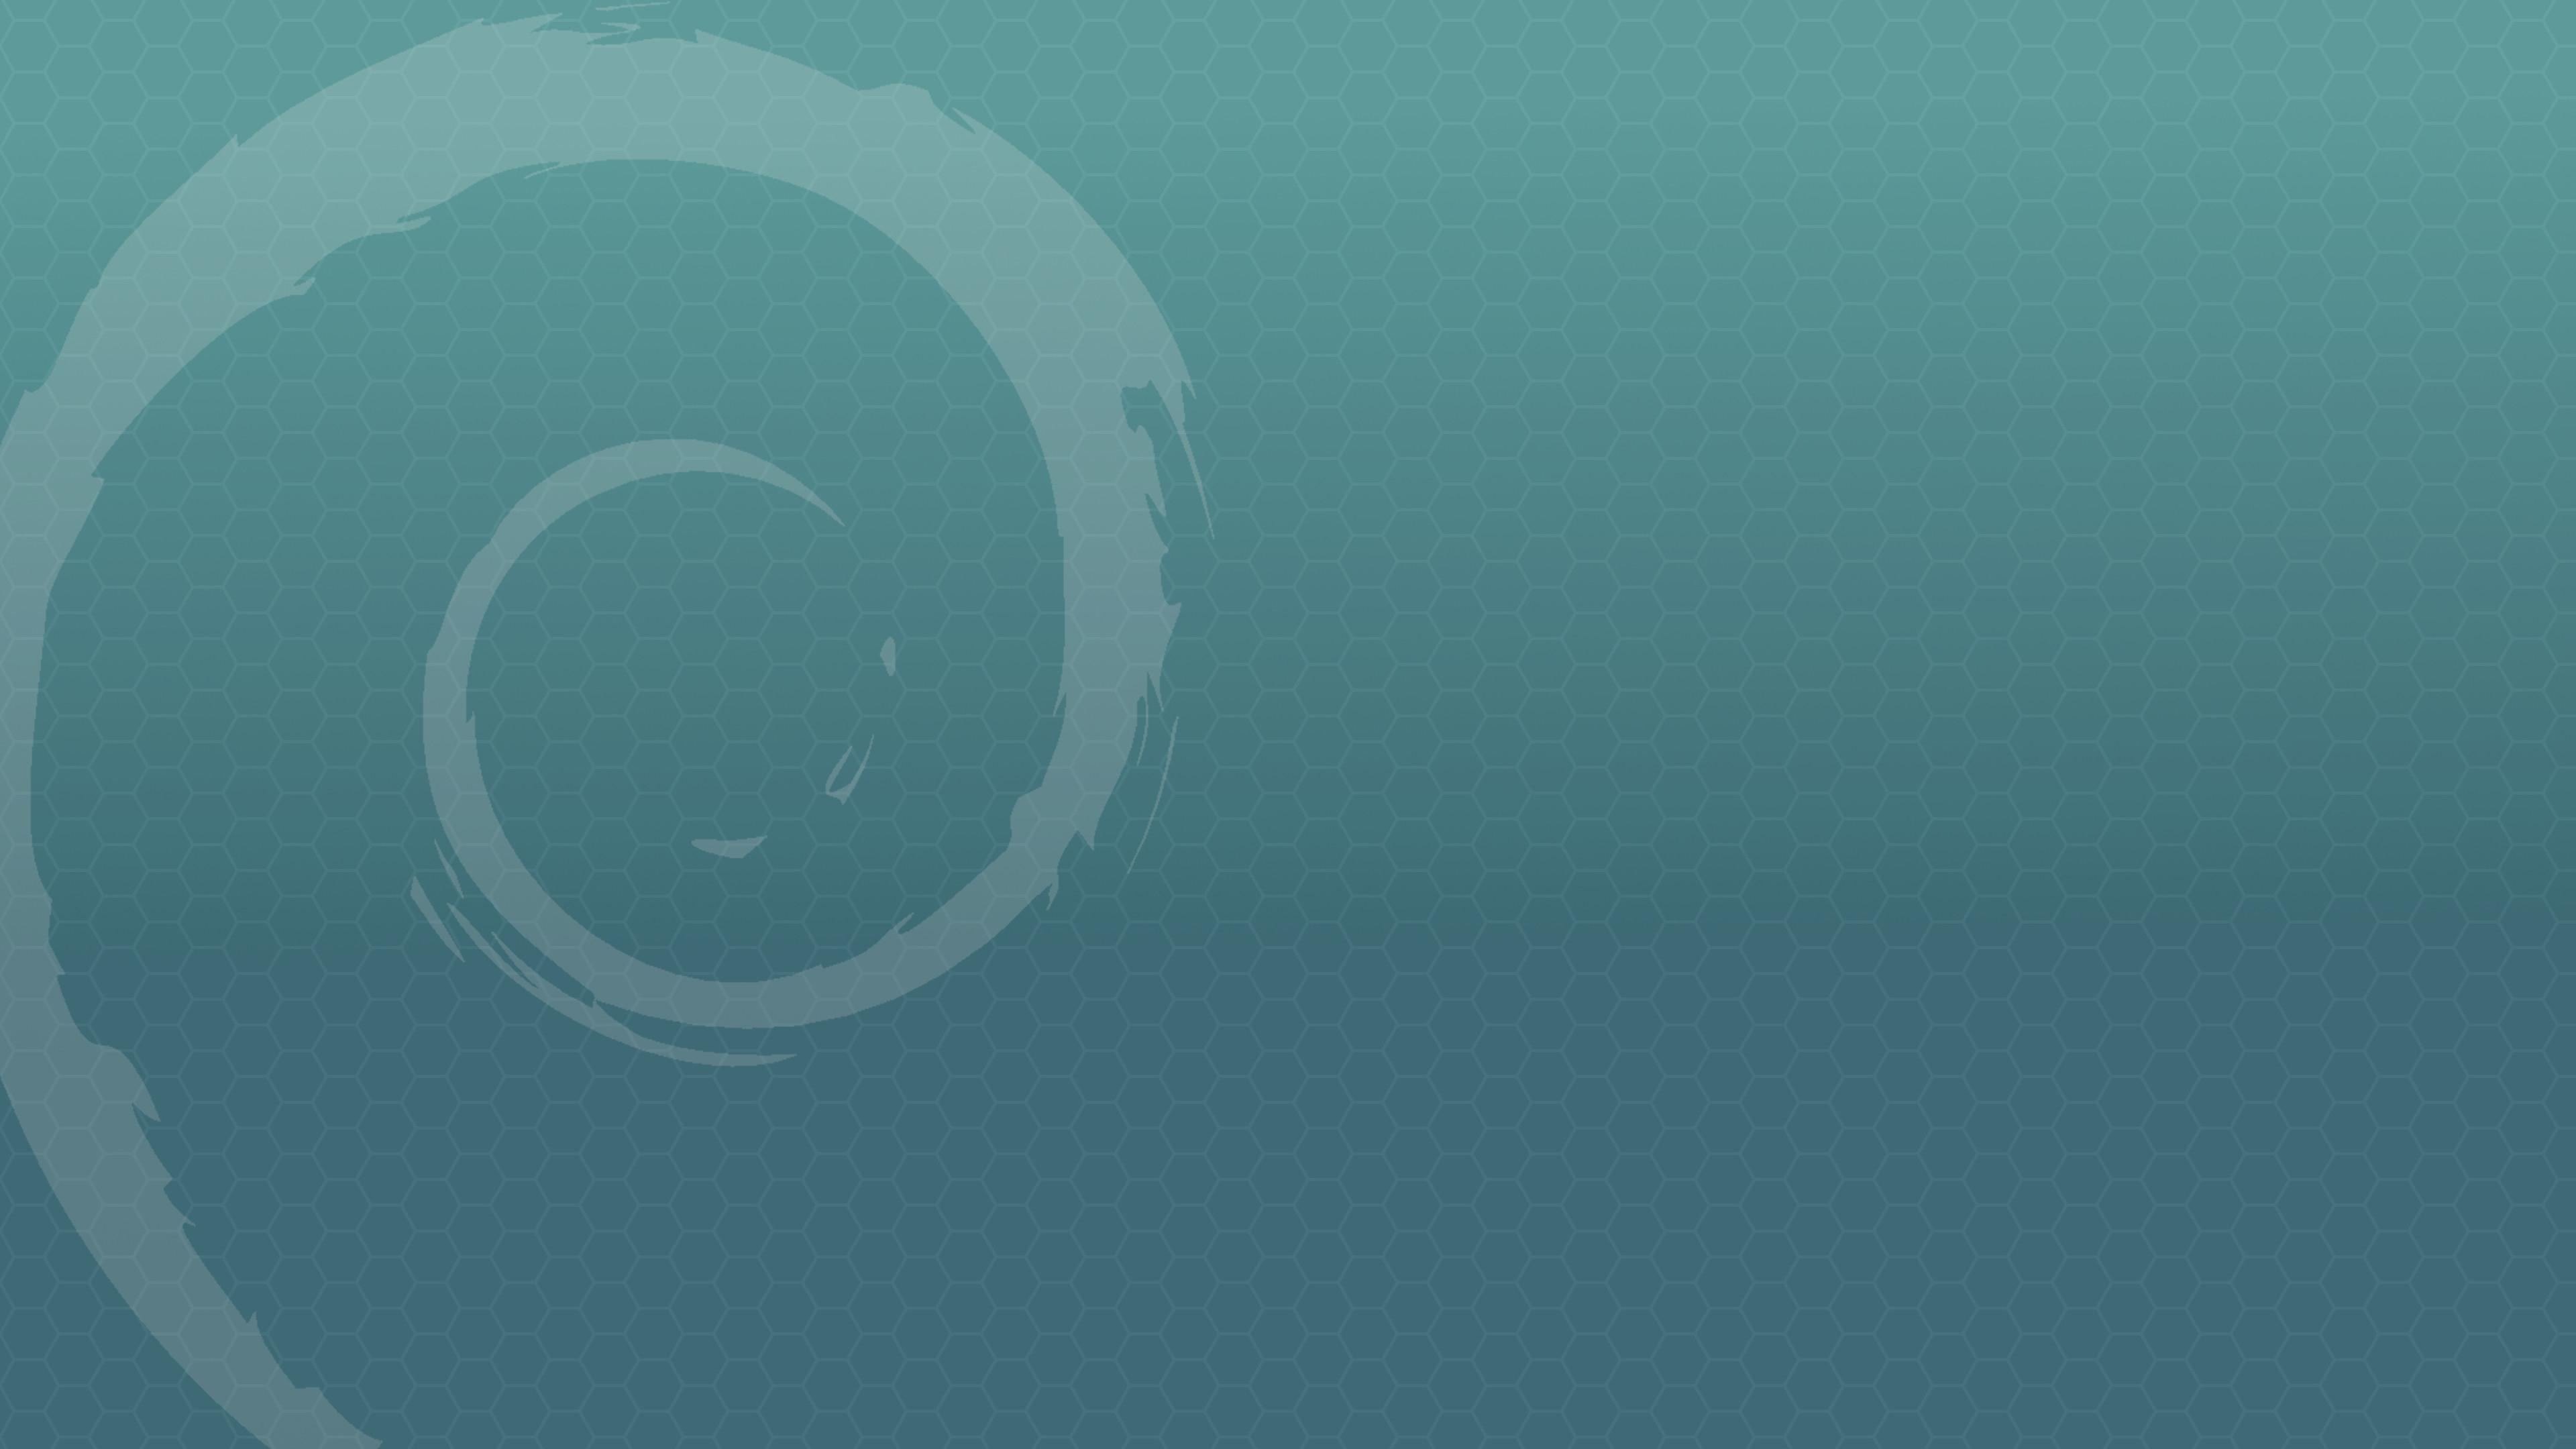 82 Debian Wallpapers on WallpaperPlay 3840x2160